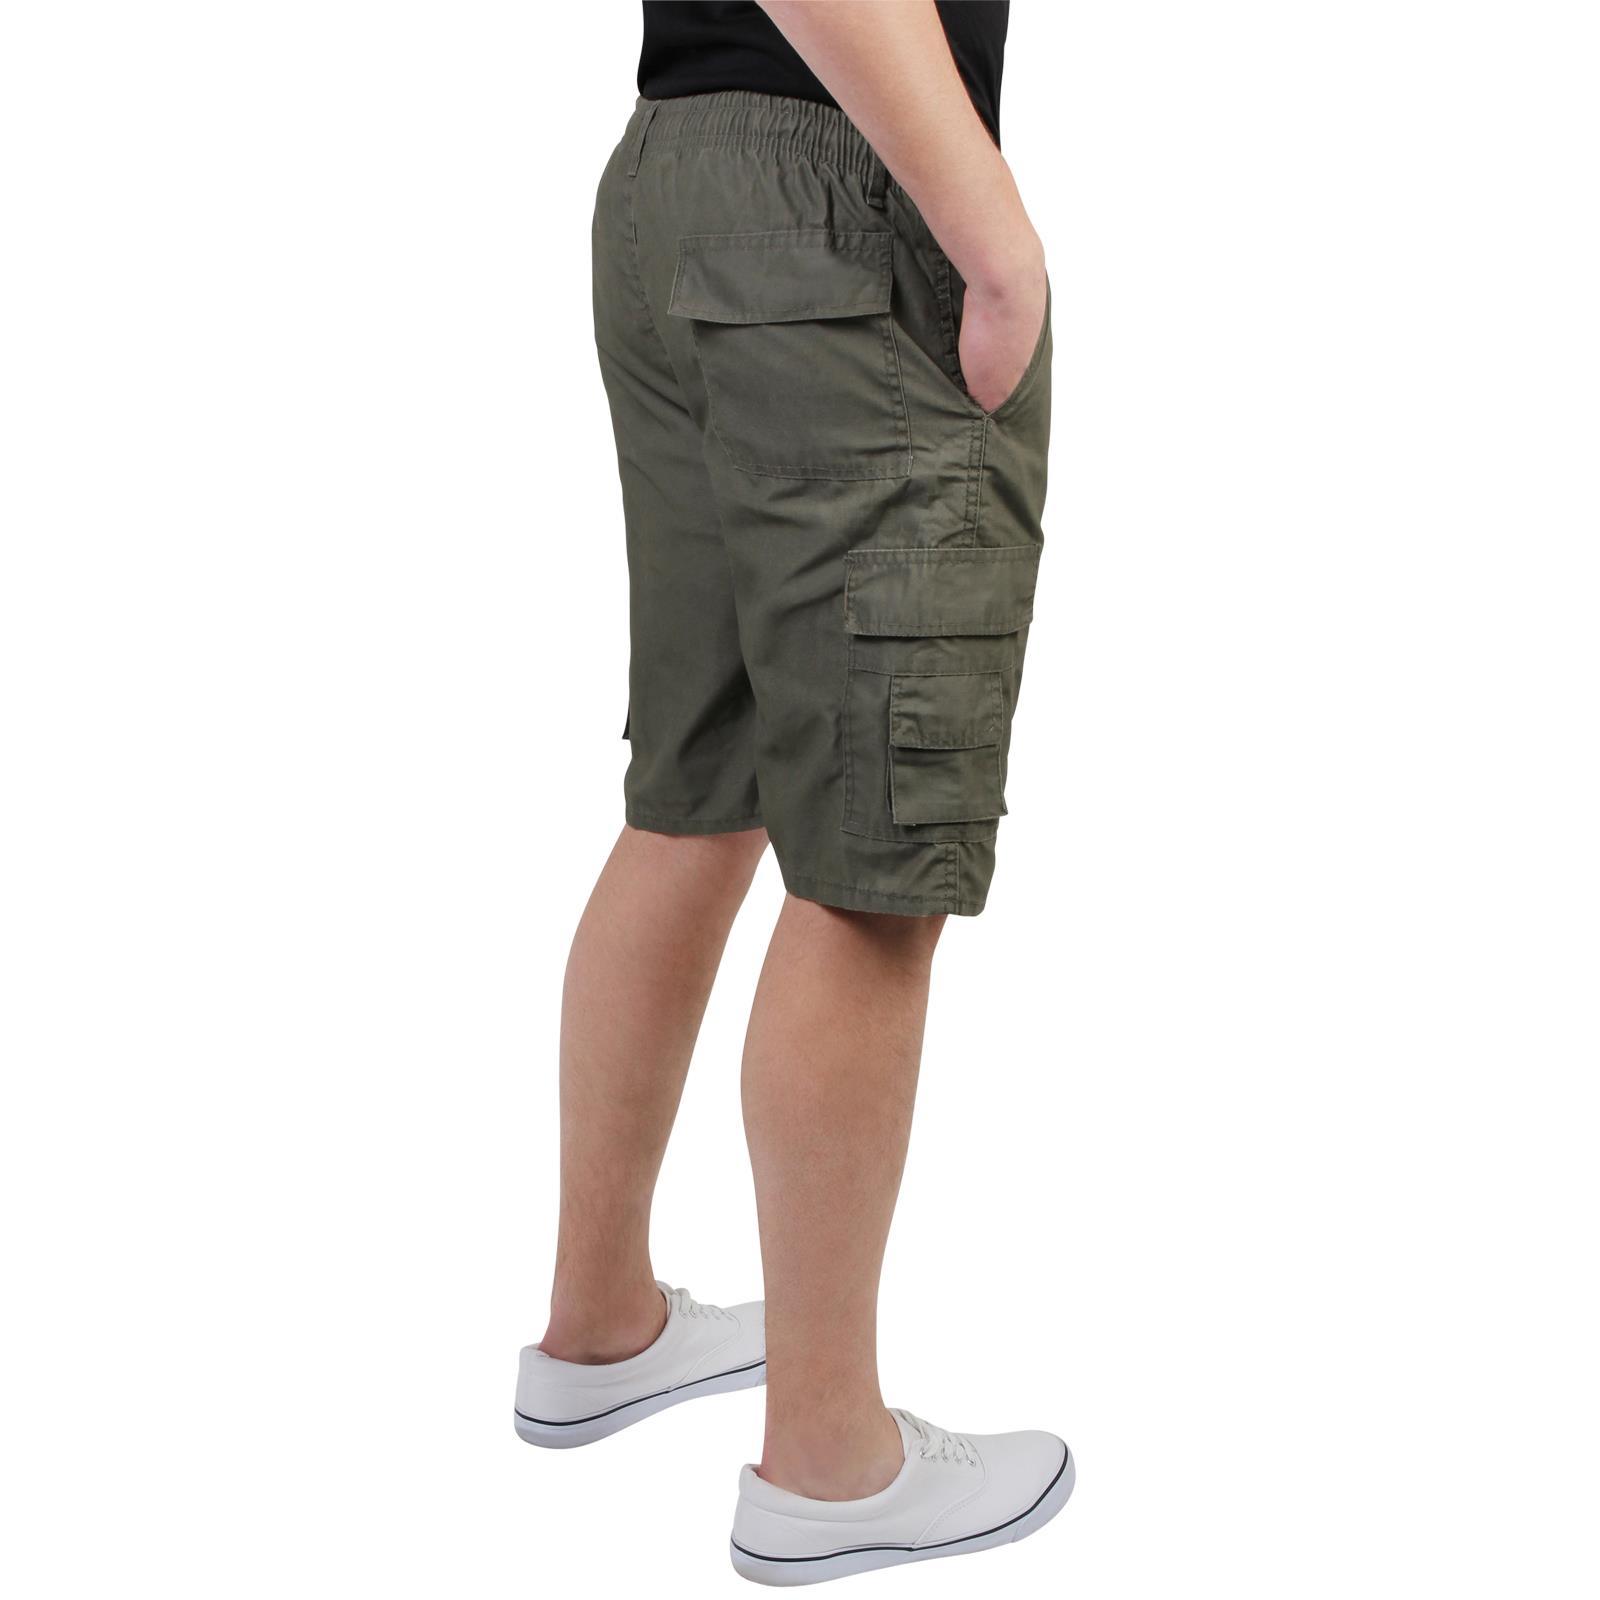 Mens-Cotton-Cargo-Shorts-Plain-Basic-Casual-Work-Chinos-Combat-Pants-Regular thumbnail 6